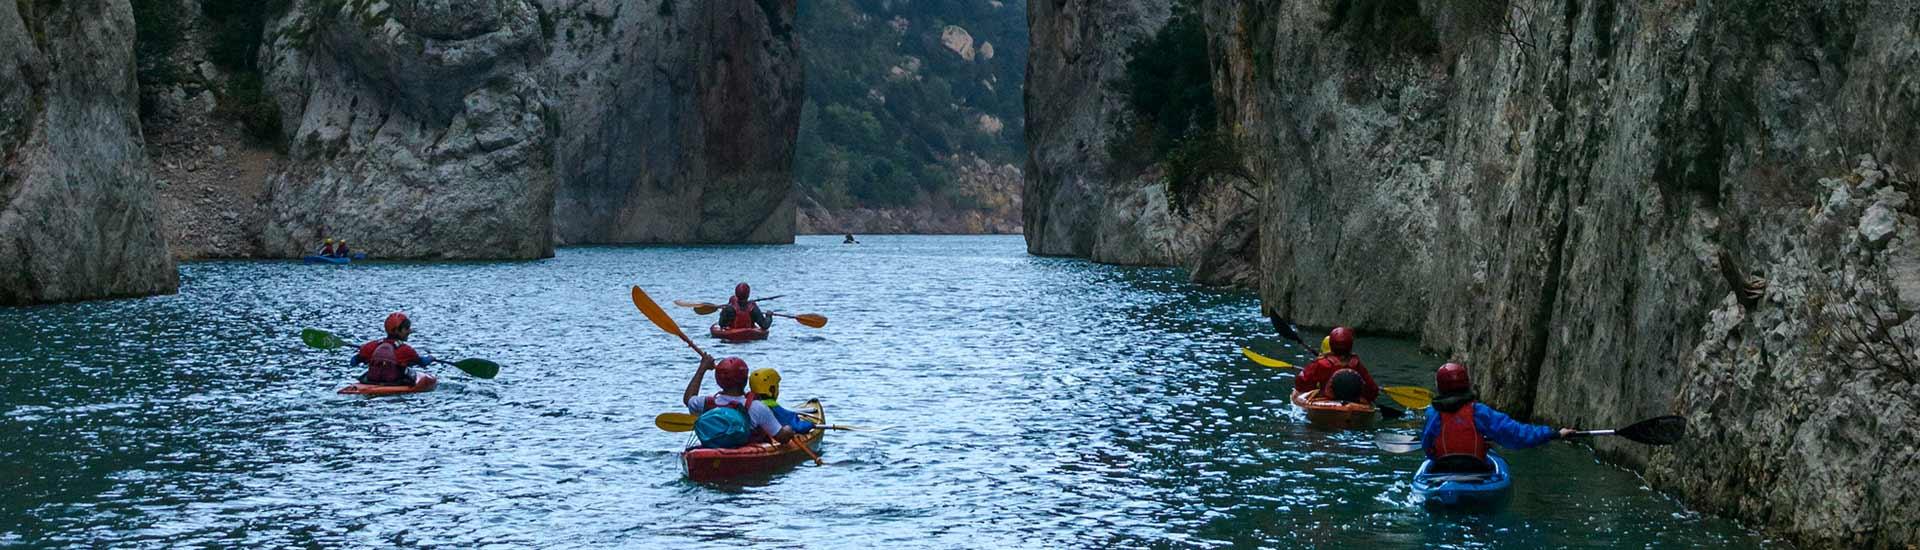 kayak con niños